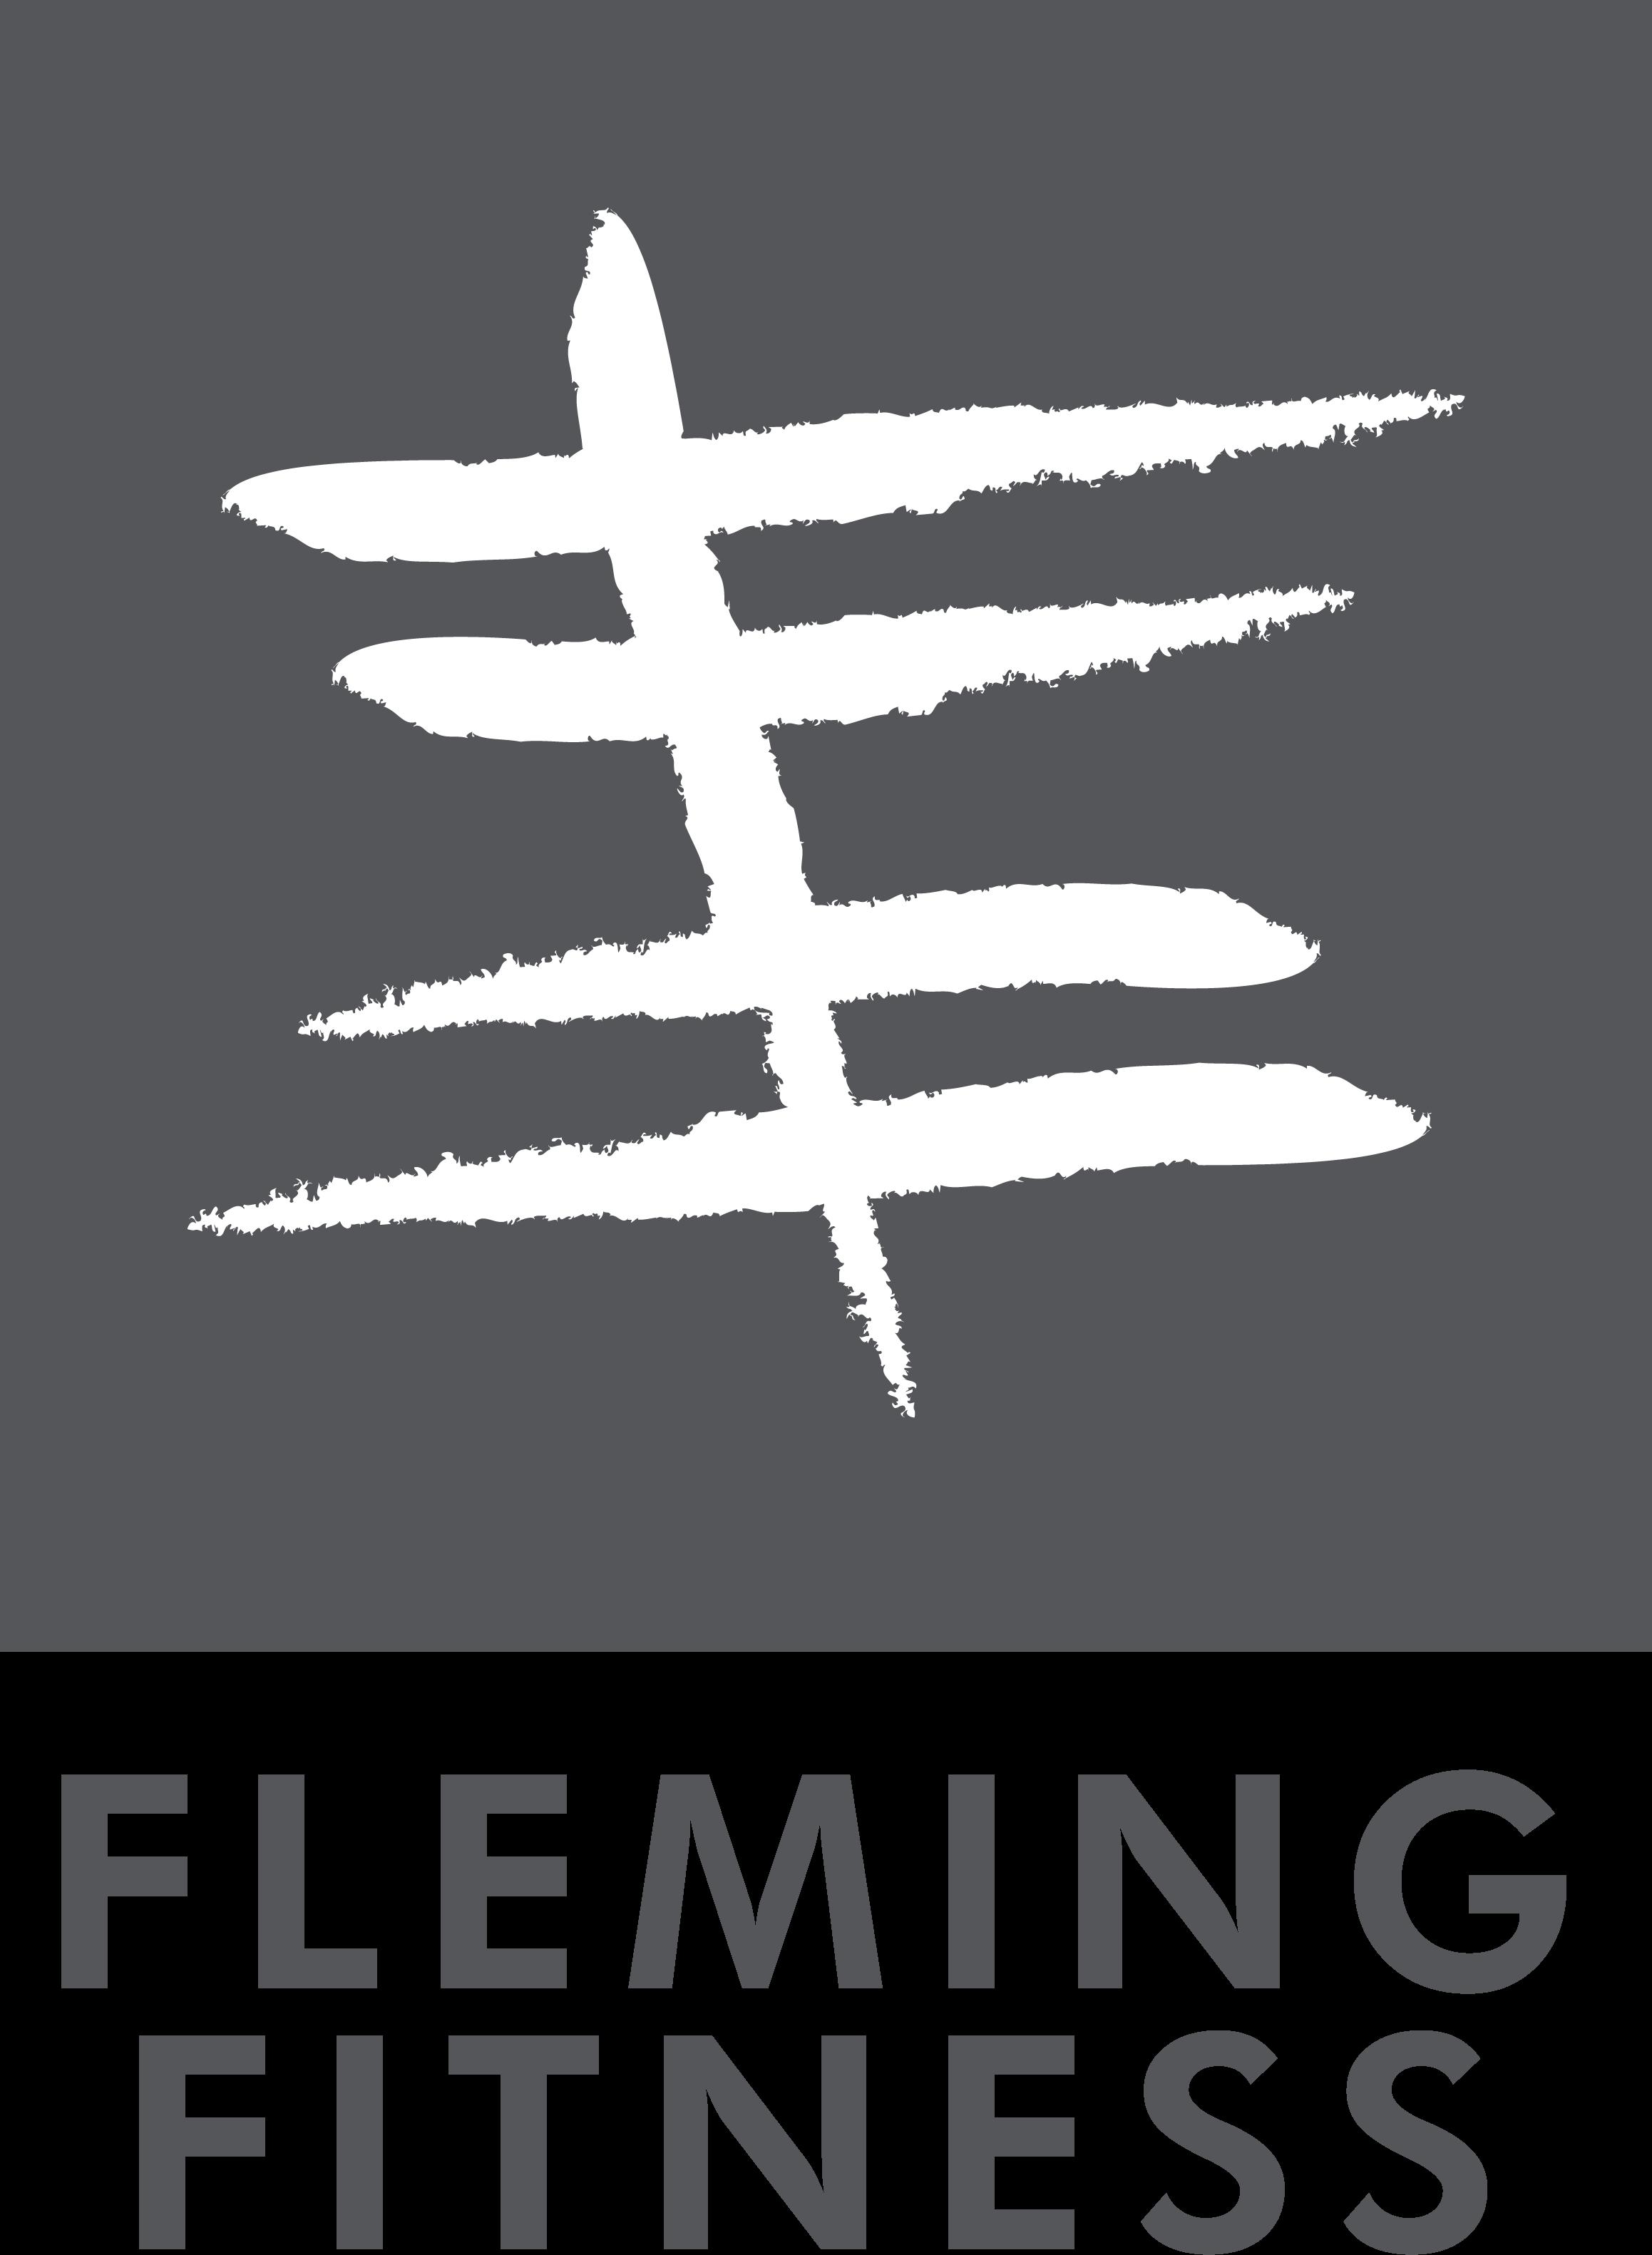 Fleming Fitness